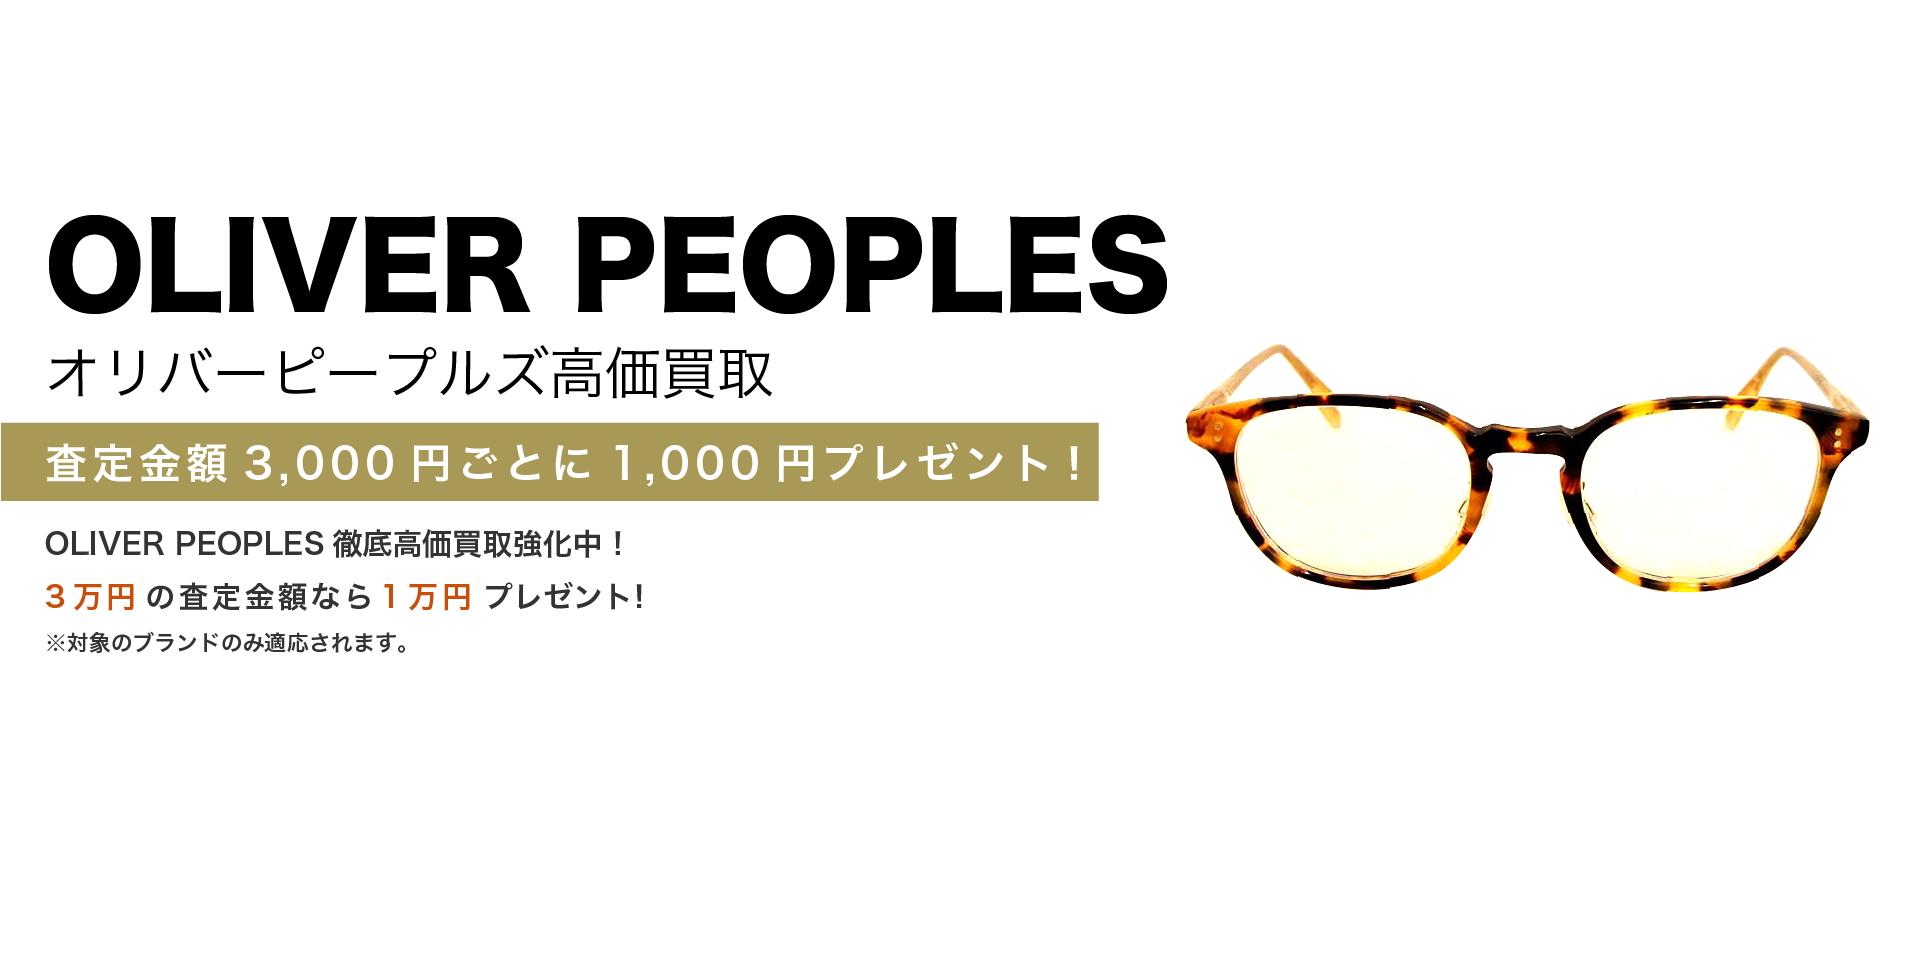 OLIVER PEOPLESのキービジュアル